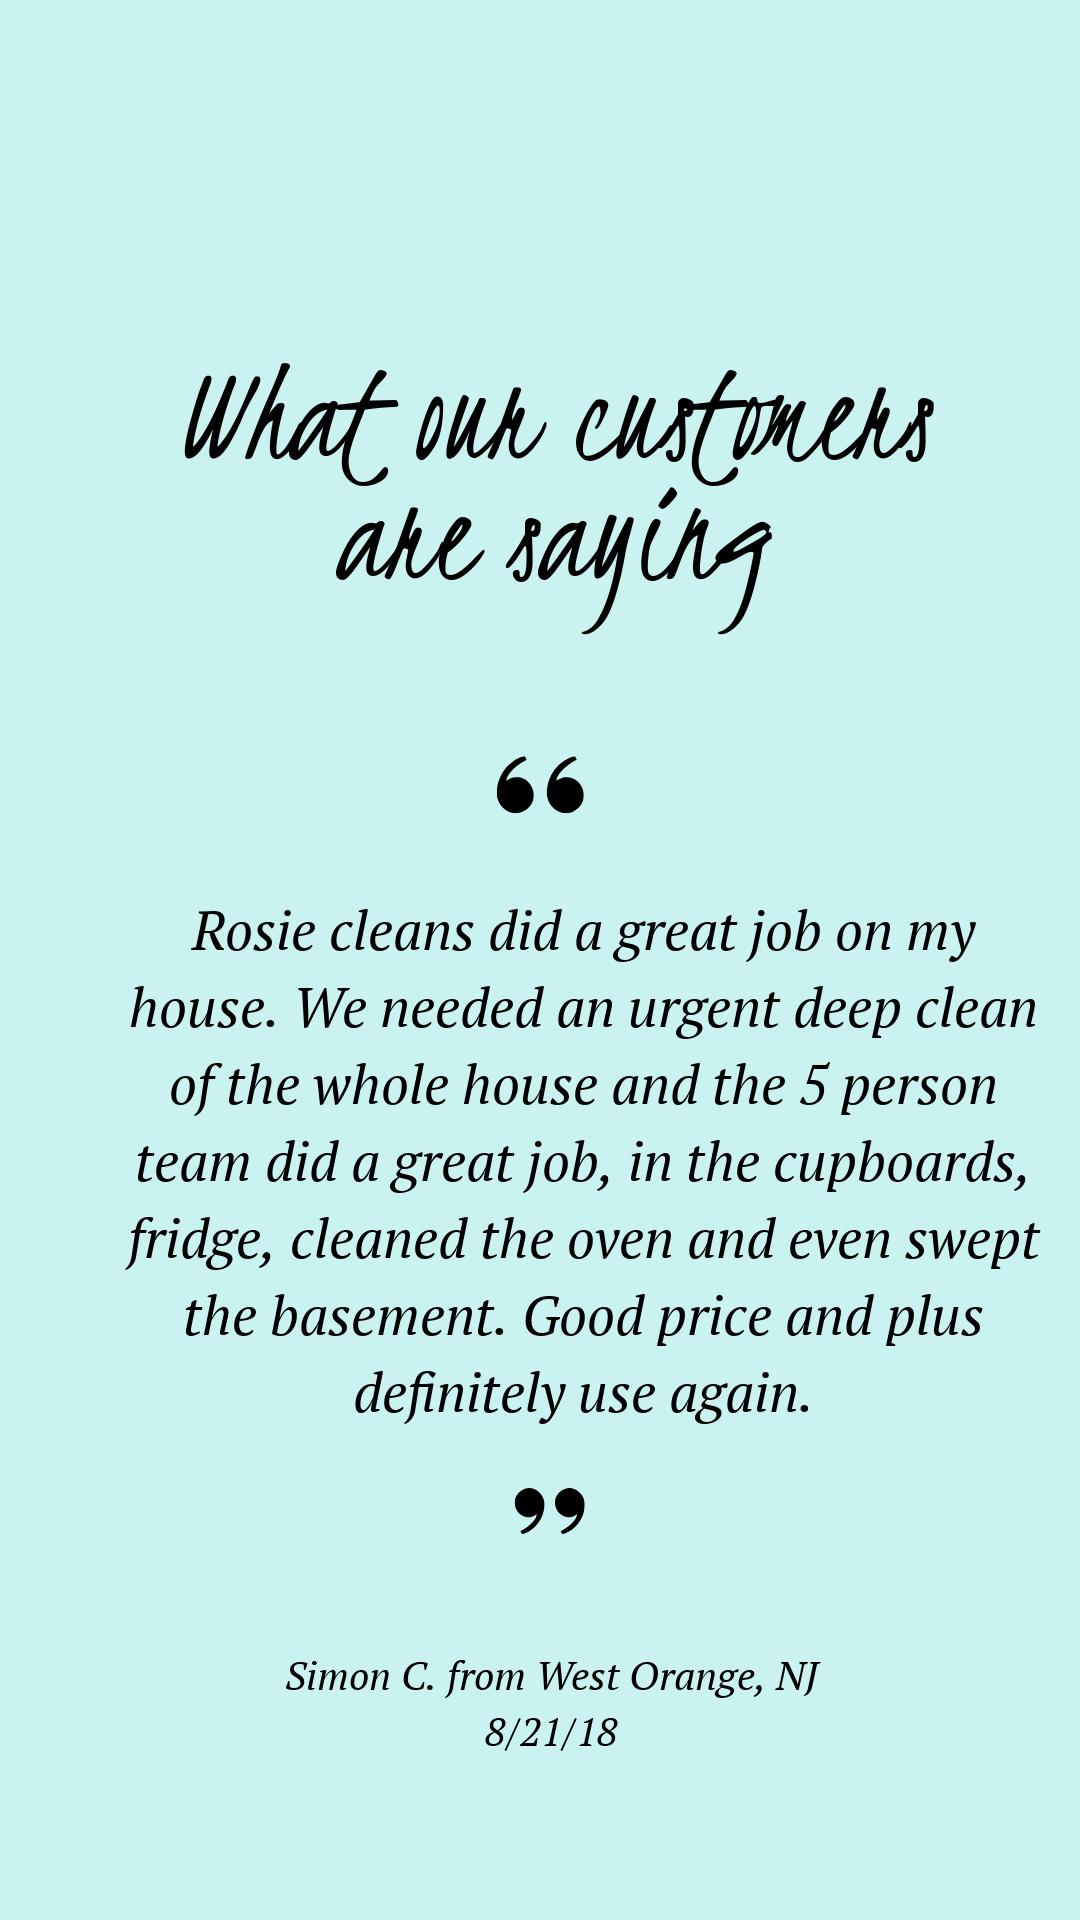 Rosie Cleans Background Check